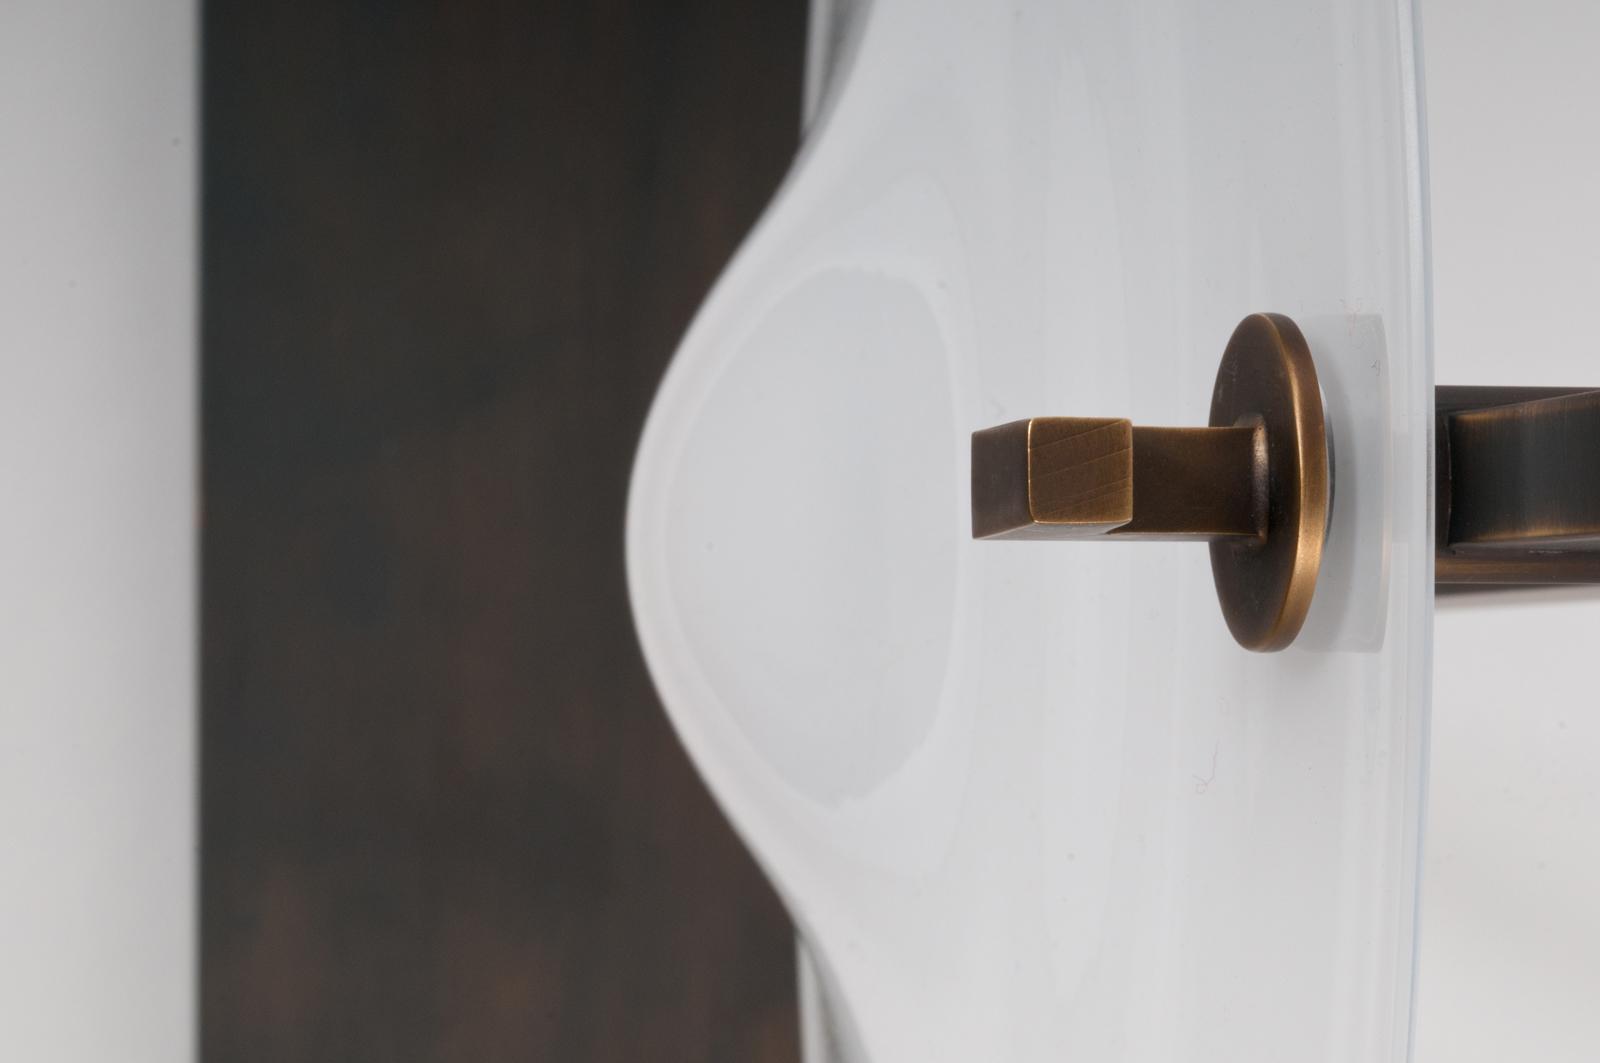 orbe-table-bronze-soie-silk-patrick-naggar-veronese-2.jpg